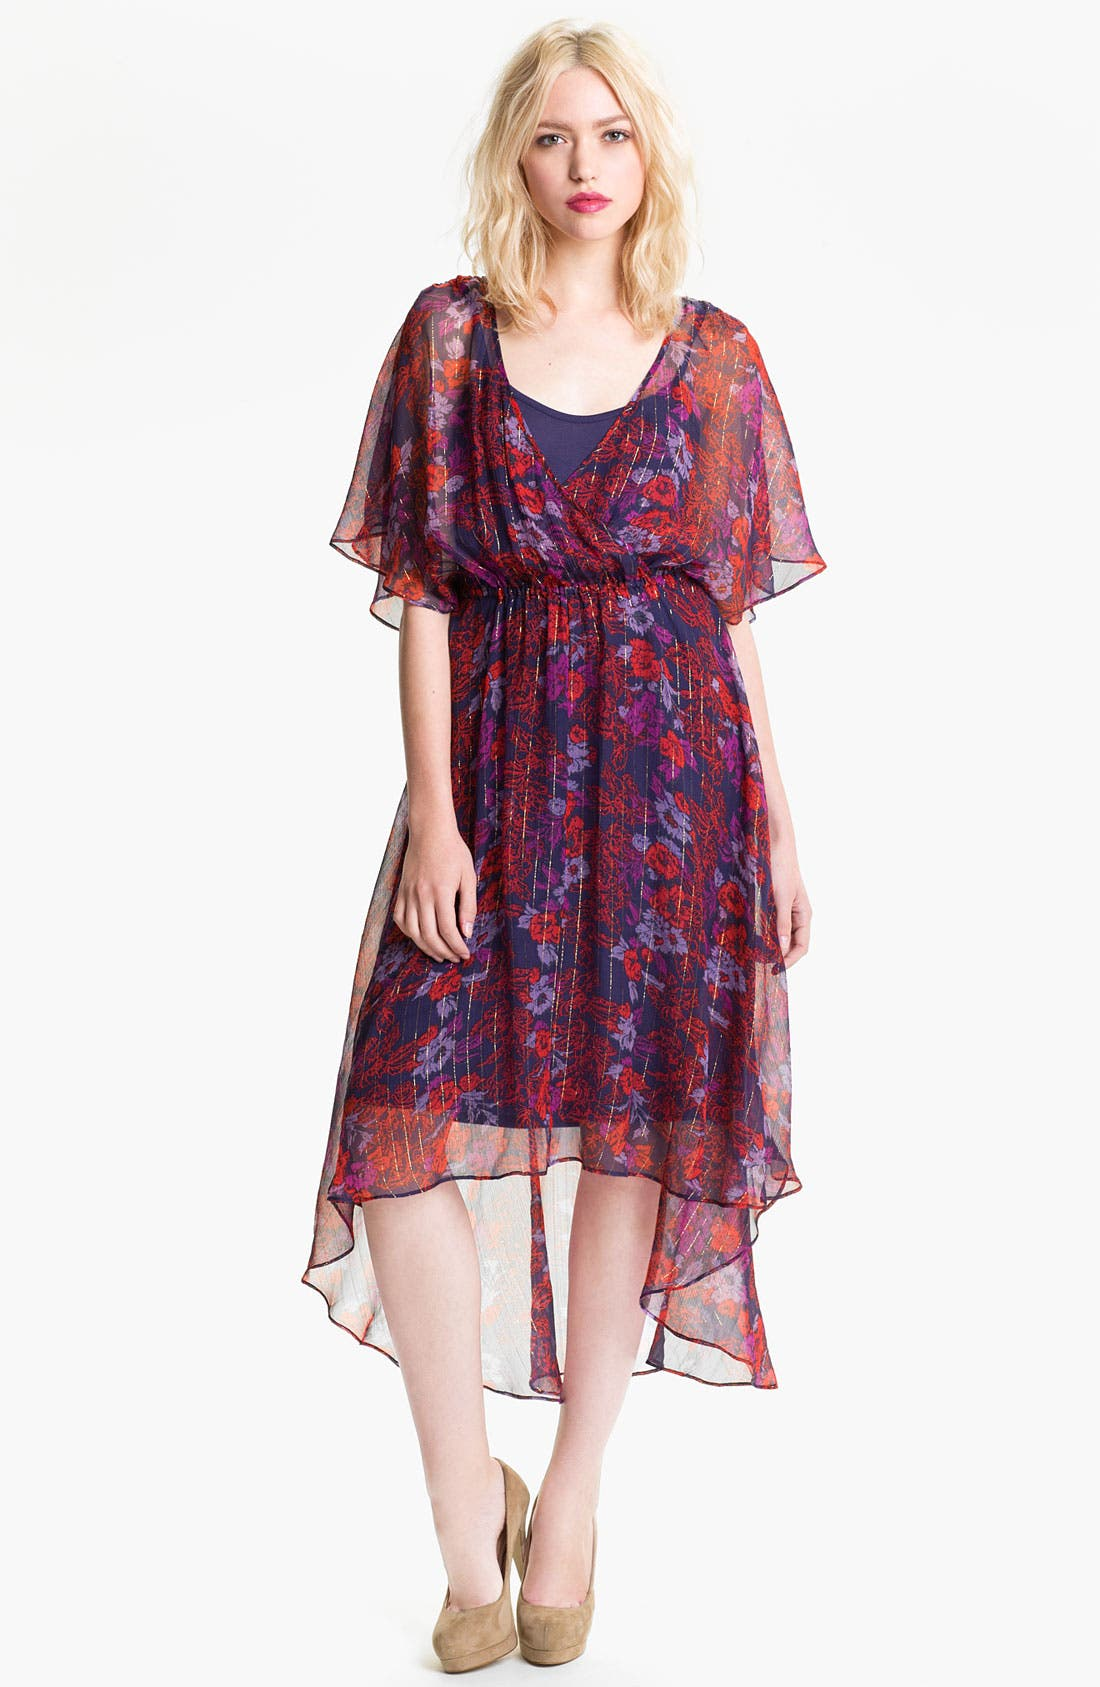 Alternate Image 1 Selected - Ella Moss 'Rosemary' High/Low Print Dress